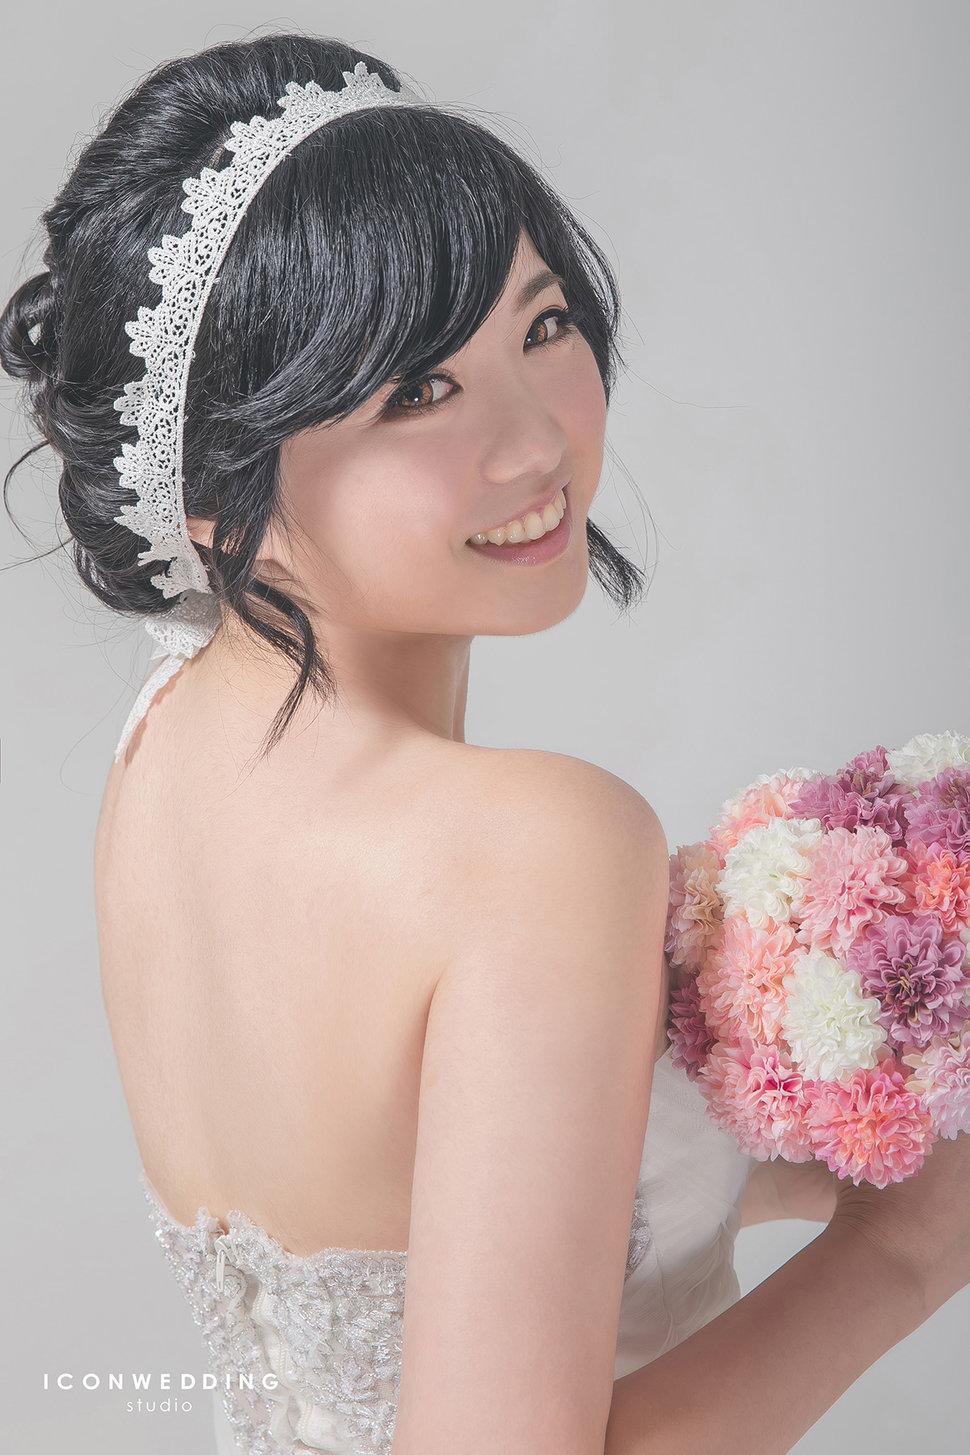 AD7X6567 - 愛情符號 ‧ 玩拍婚紗 ‧ 海外婚紗 - 結婚吧